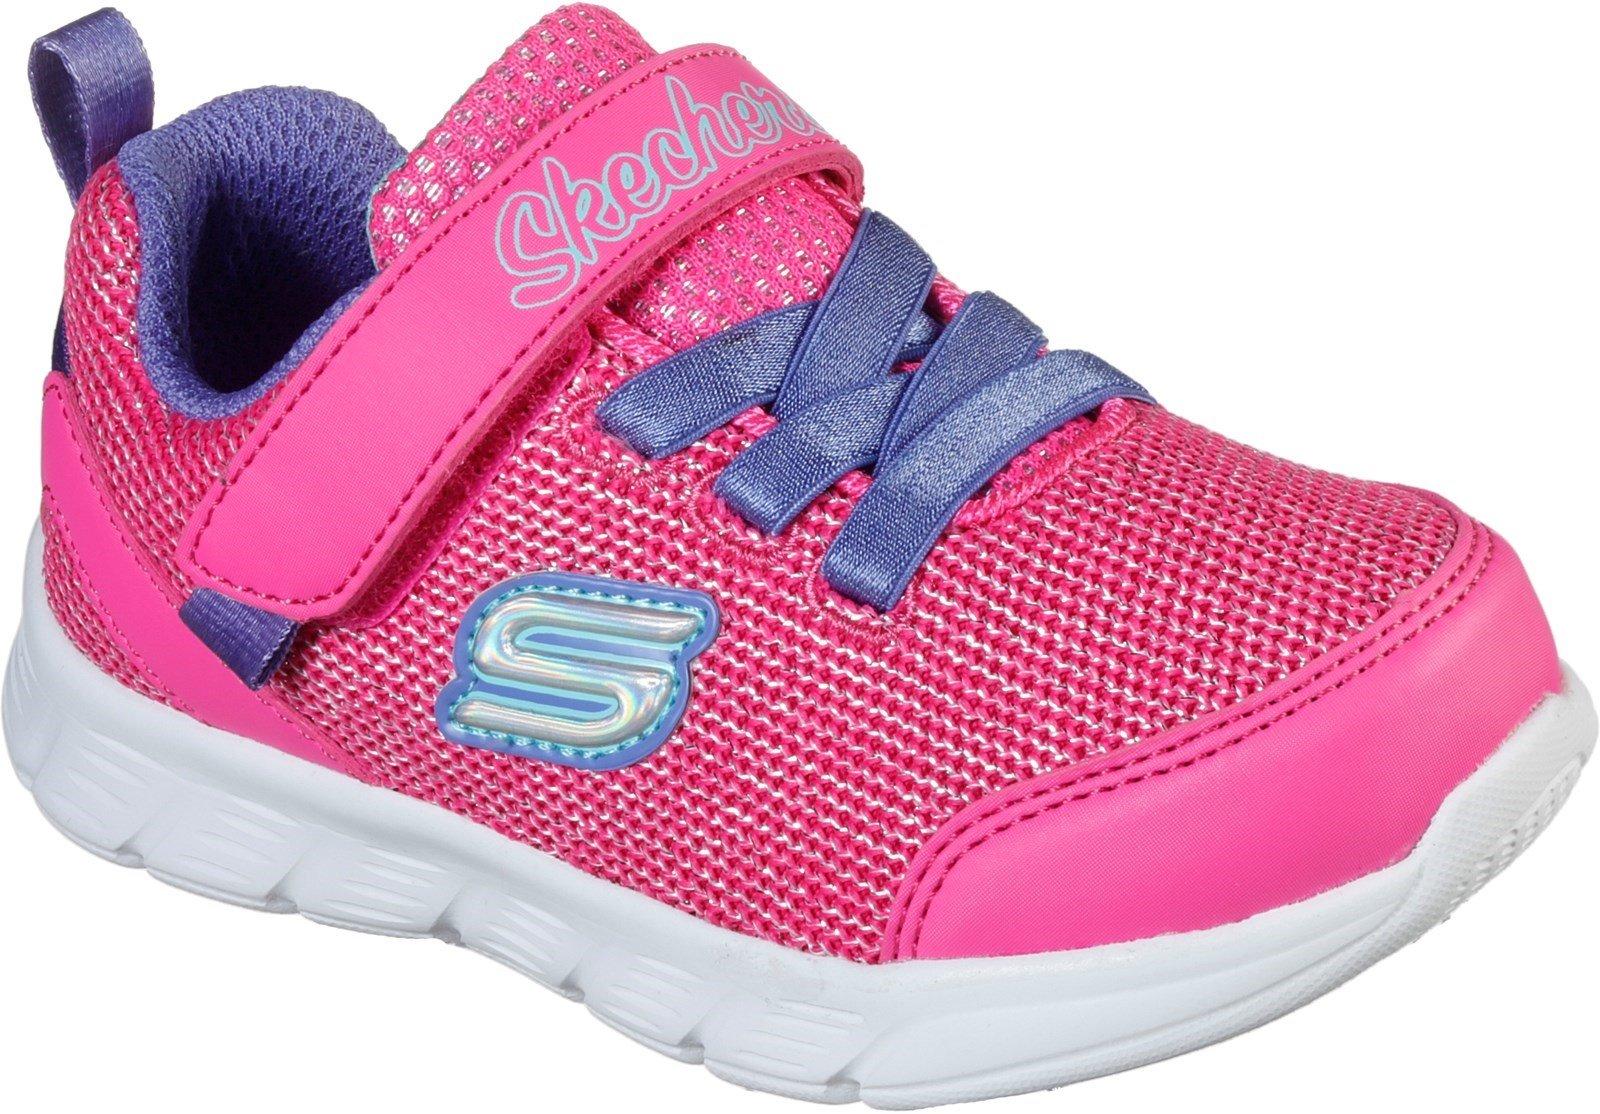 Skechers Kid's Comfy Flex Sports Trainer Various Colours 31139 - Hot Pink/Purple 4